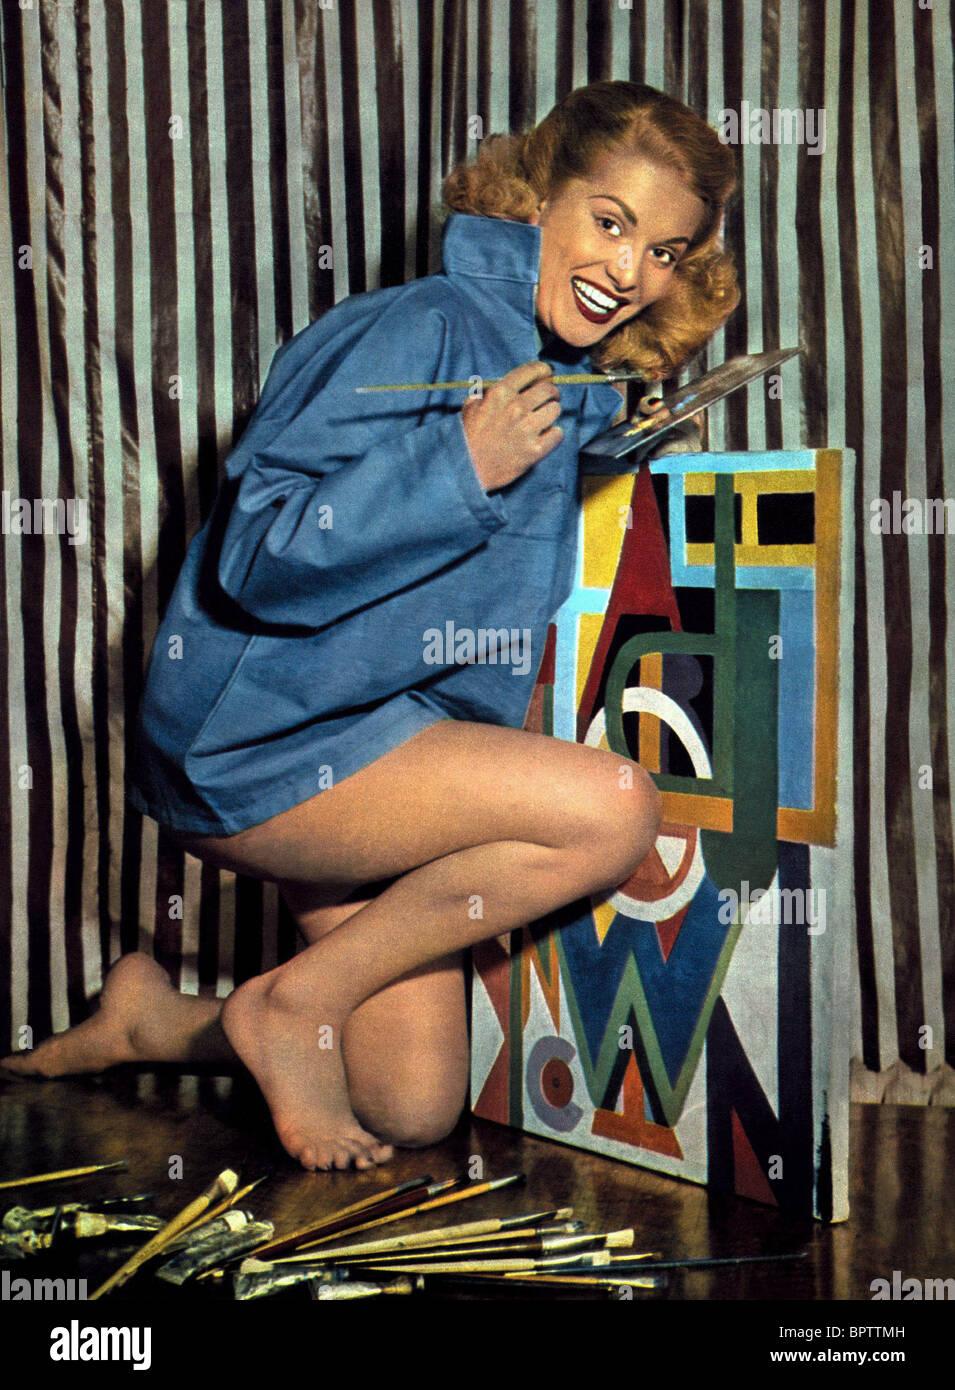 Patricia Heaton born March 4, 1958 (age 60),Alice Krige (born 1954 (born in Upington, South Africa) Adult fotos Elha Nympha (b. 2004),Jane Birkin (born 1946)